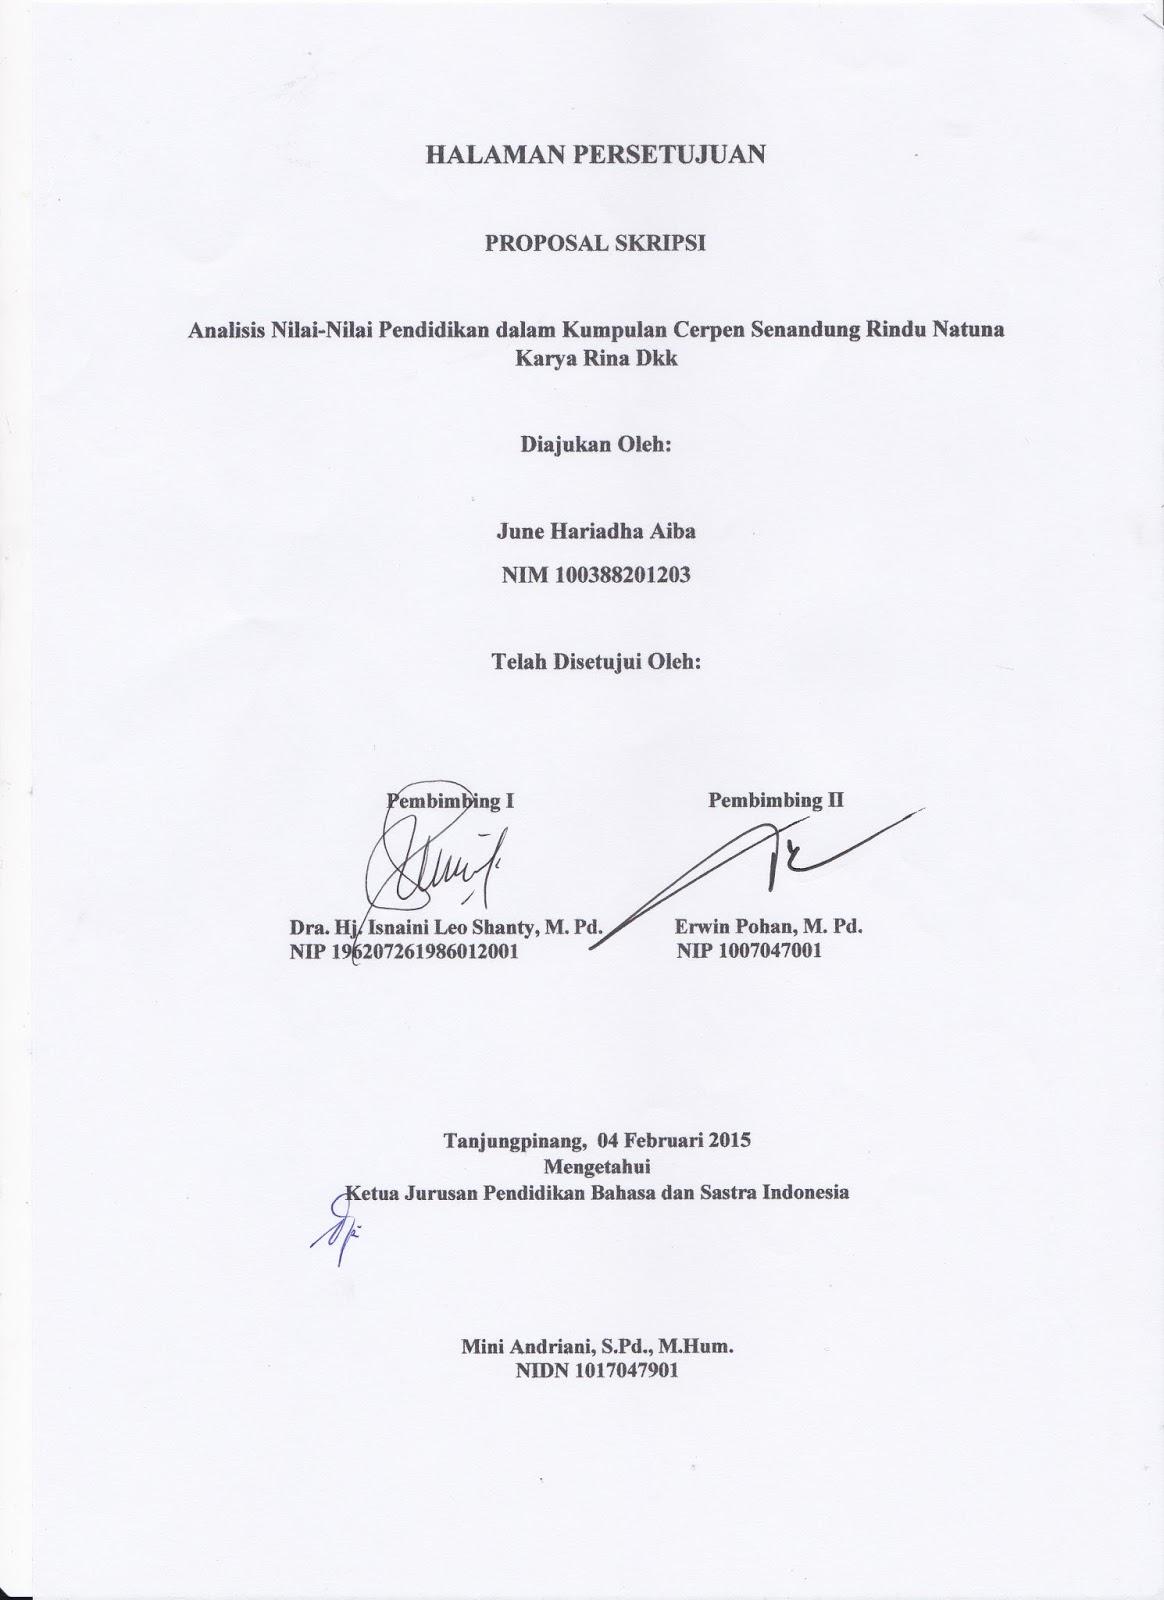 June Hariadha Aiba Analisis Nilai Nilai Pendidikan Dalam Kumpulan